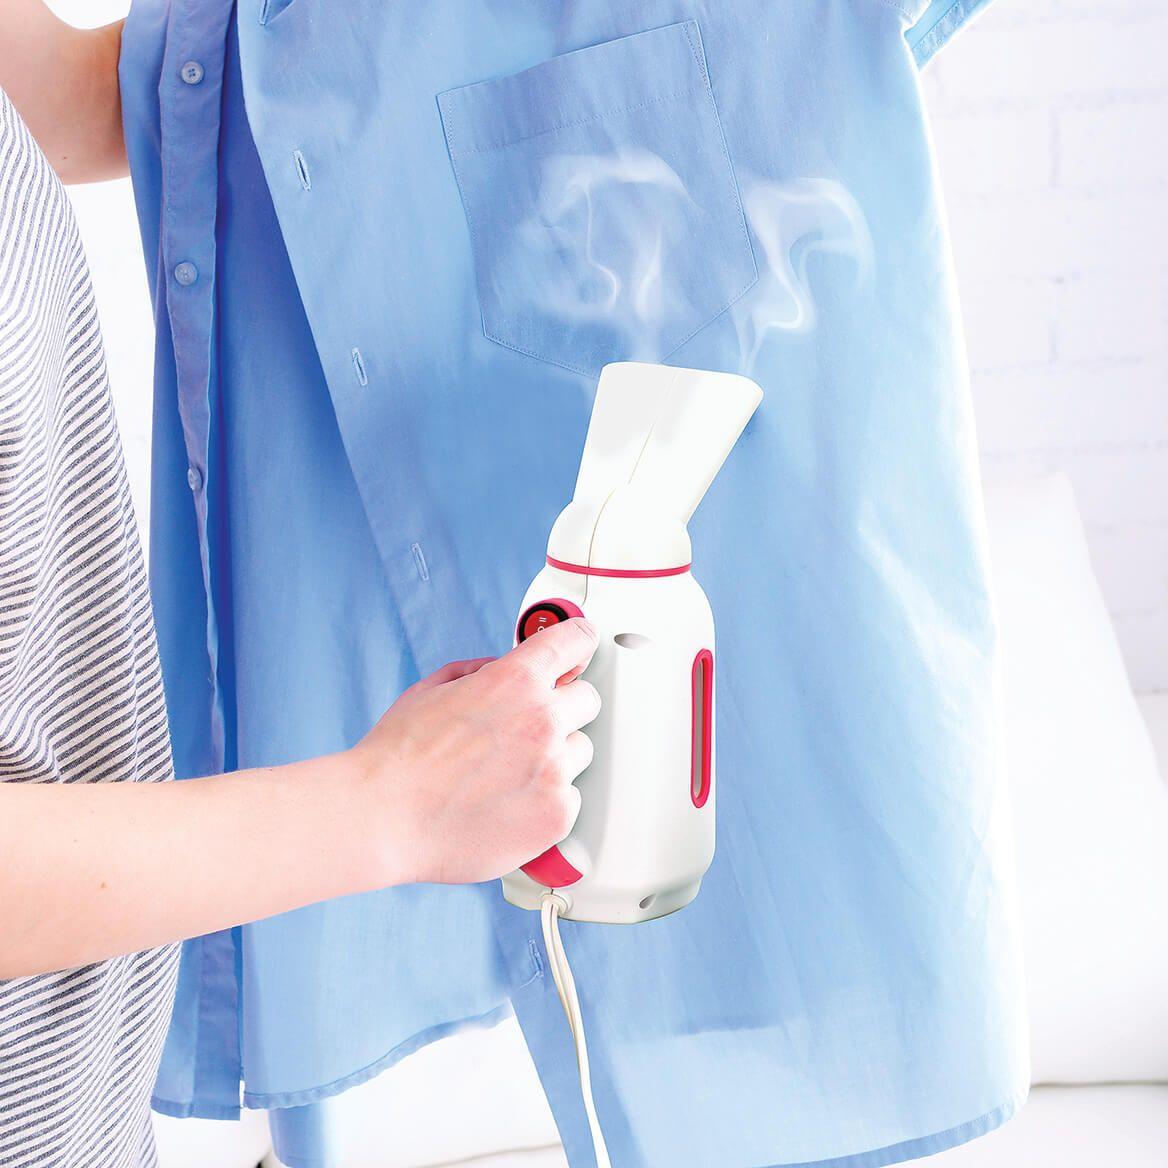 Fabric Steamer-369591